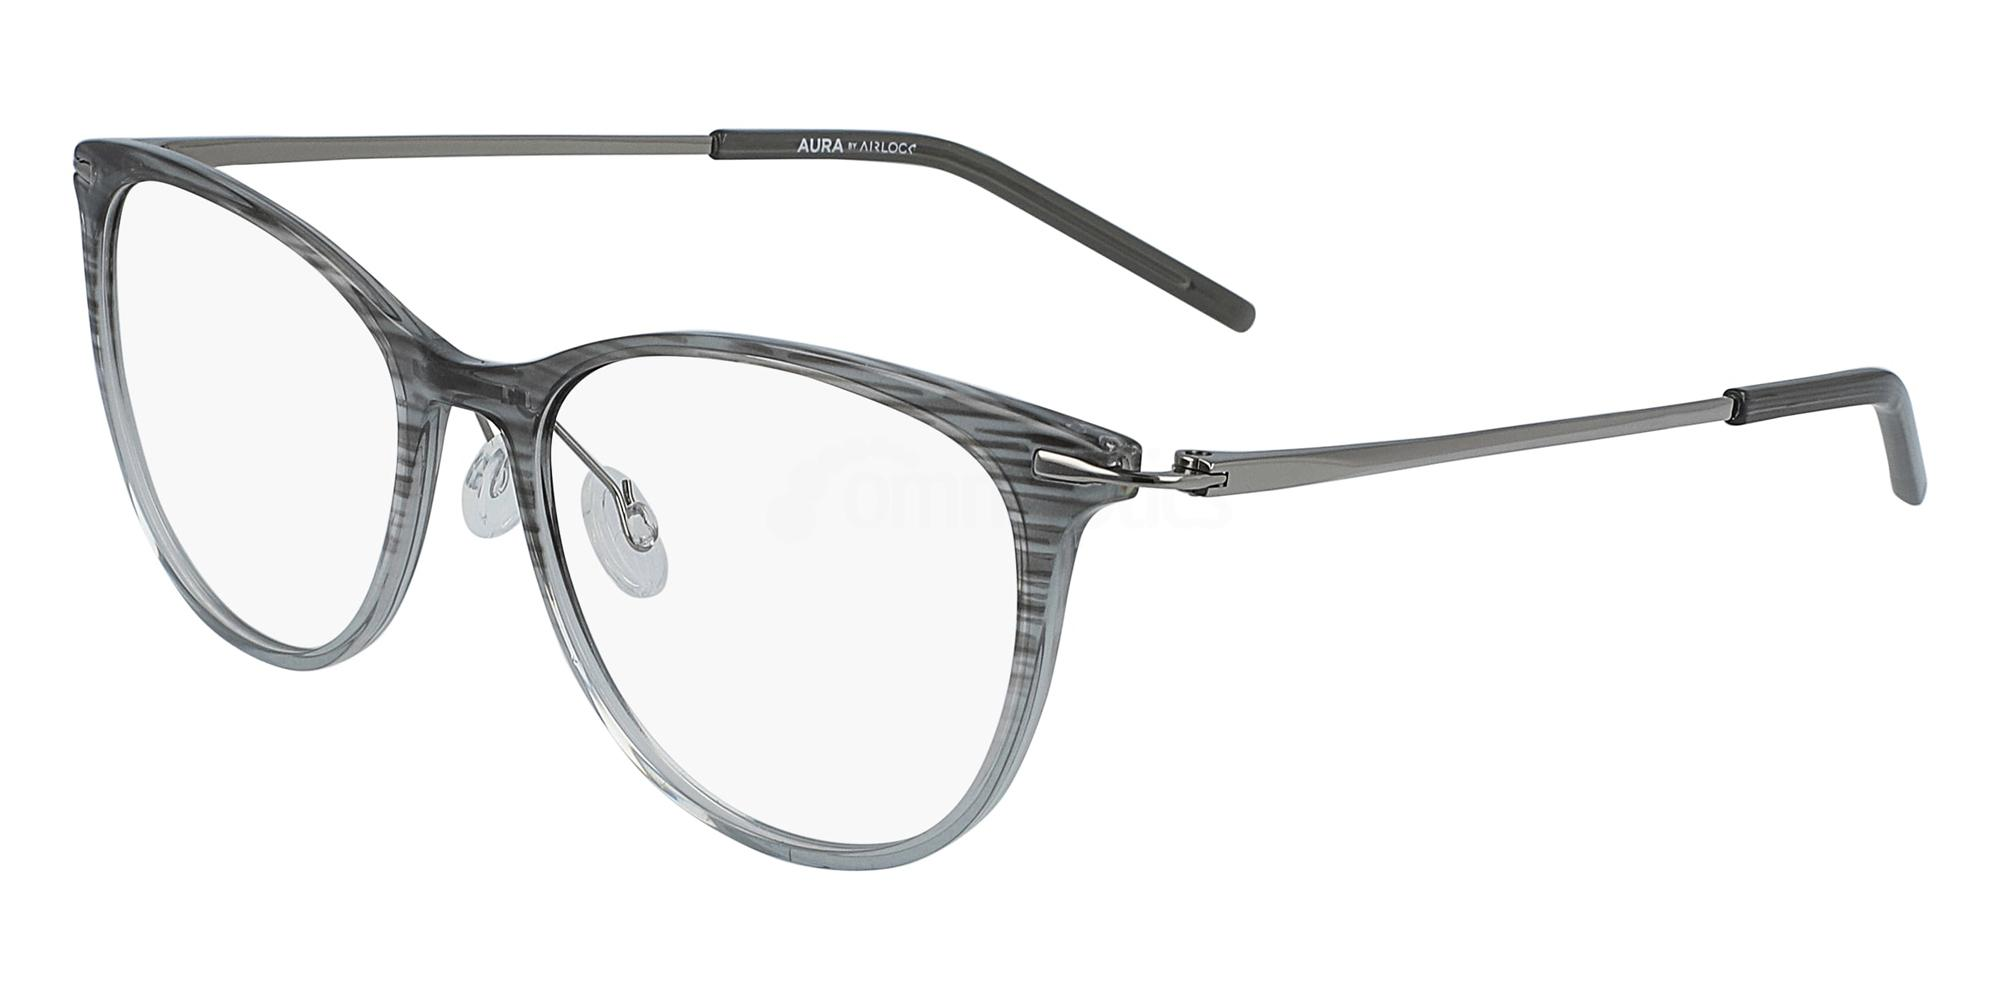 036 AIRLOCK 3004 Glasses, Pure